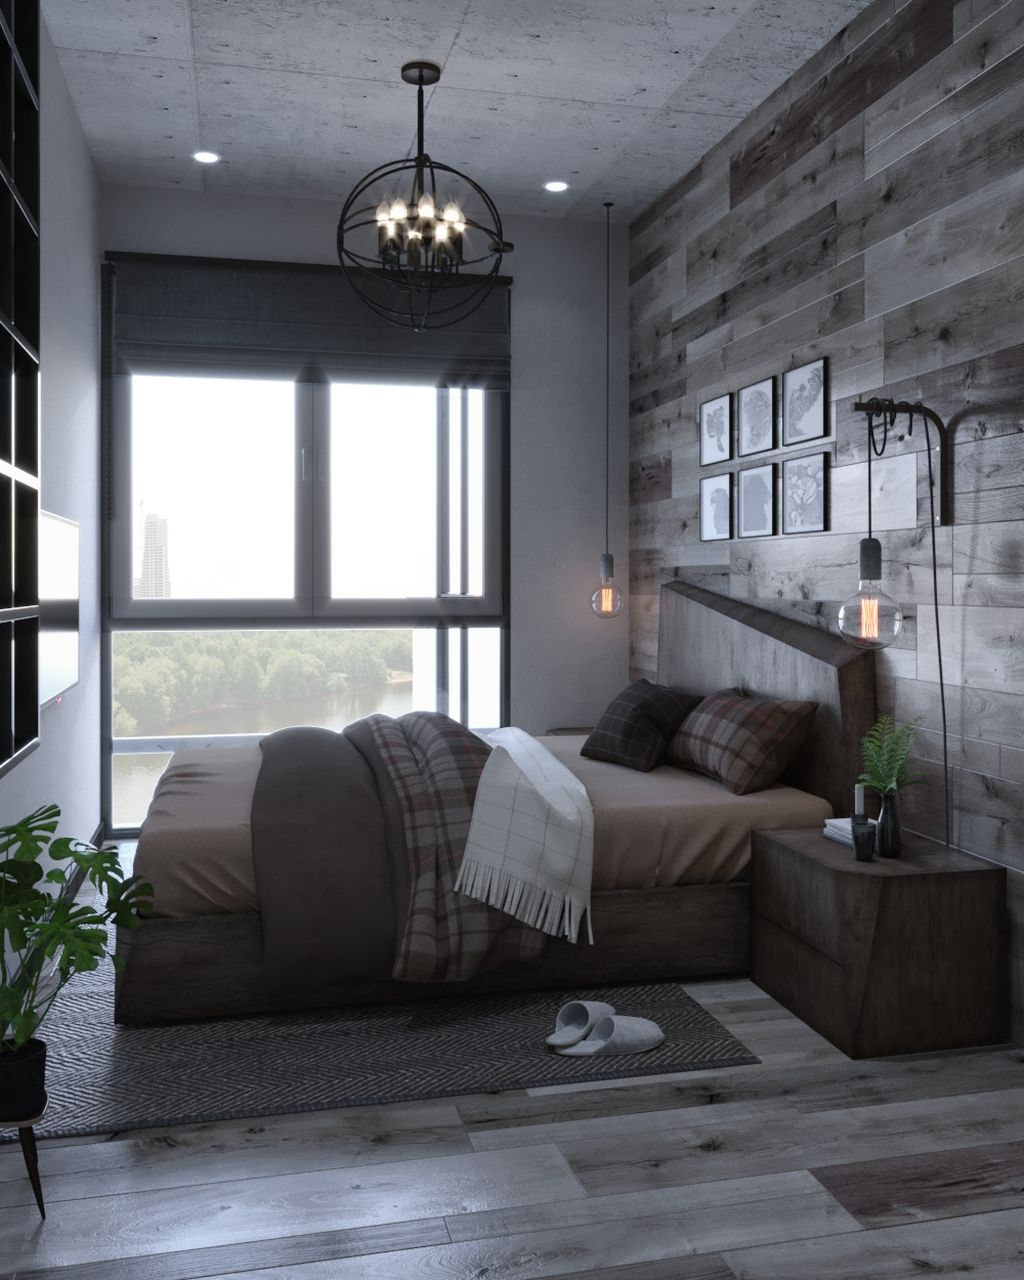 30 Modern Home Decor Ideas: 30+ Beautiful Modern Small Apartment Design Ideas